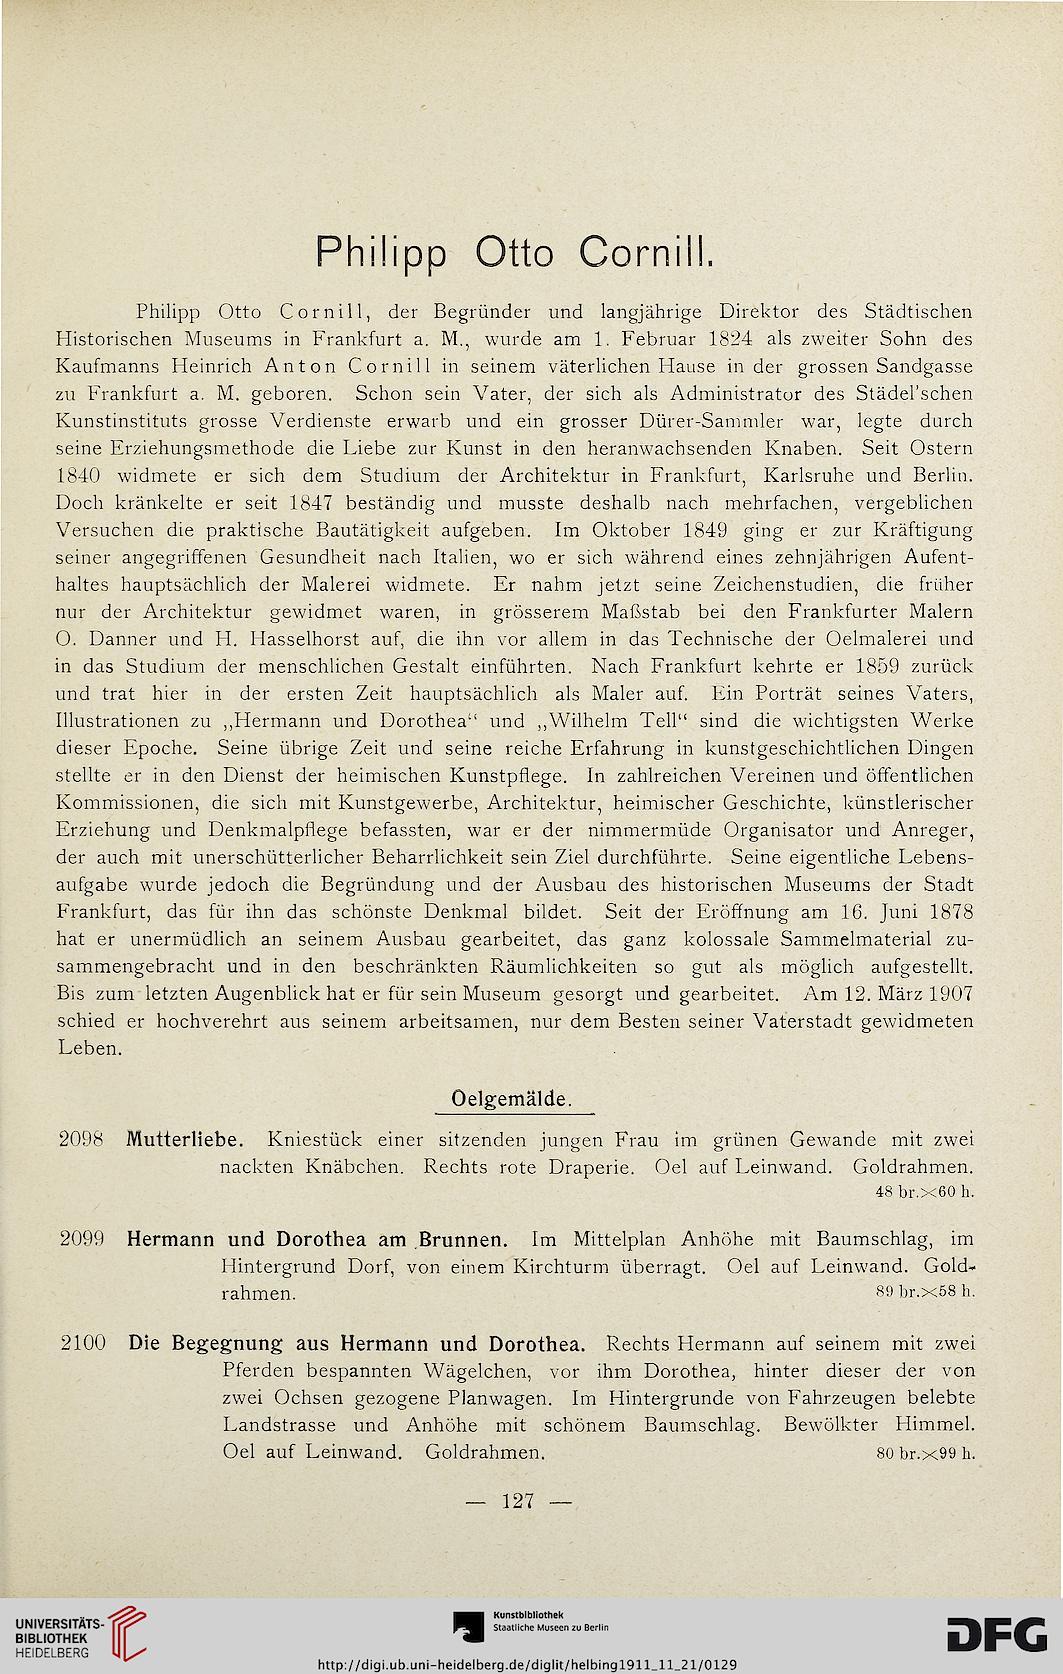 Hugo Helbing <München> [Hrsg.]: Bedeutende Francofurtensien-Sammlung ...